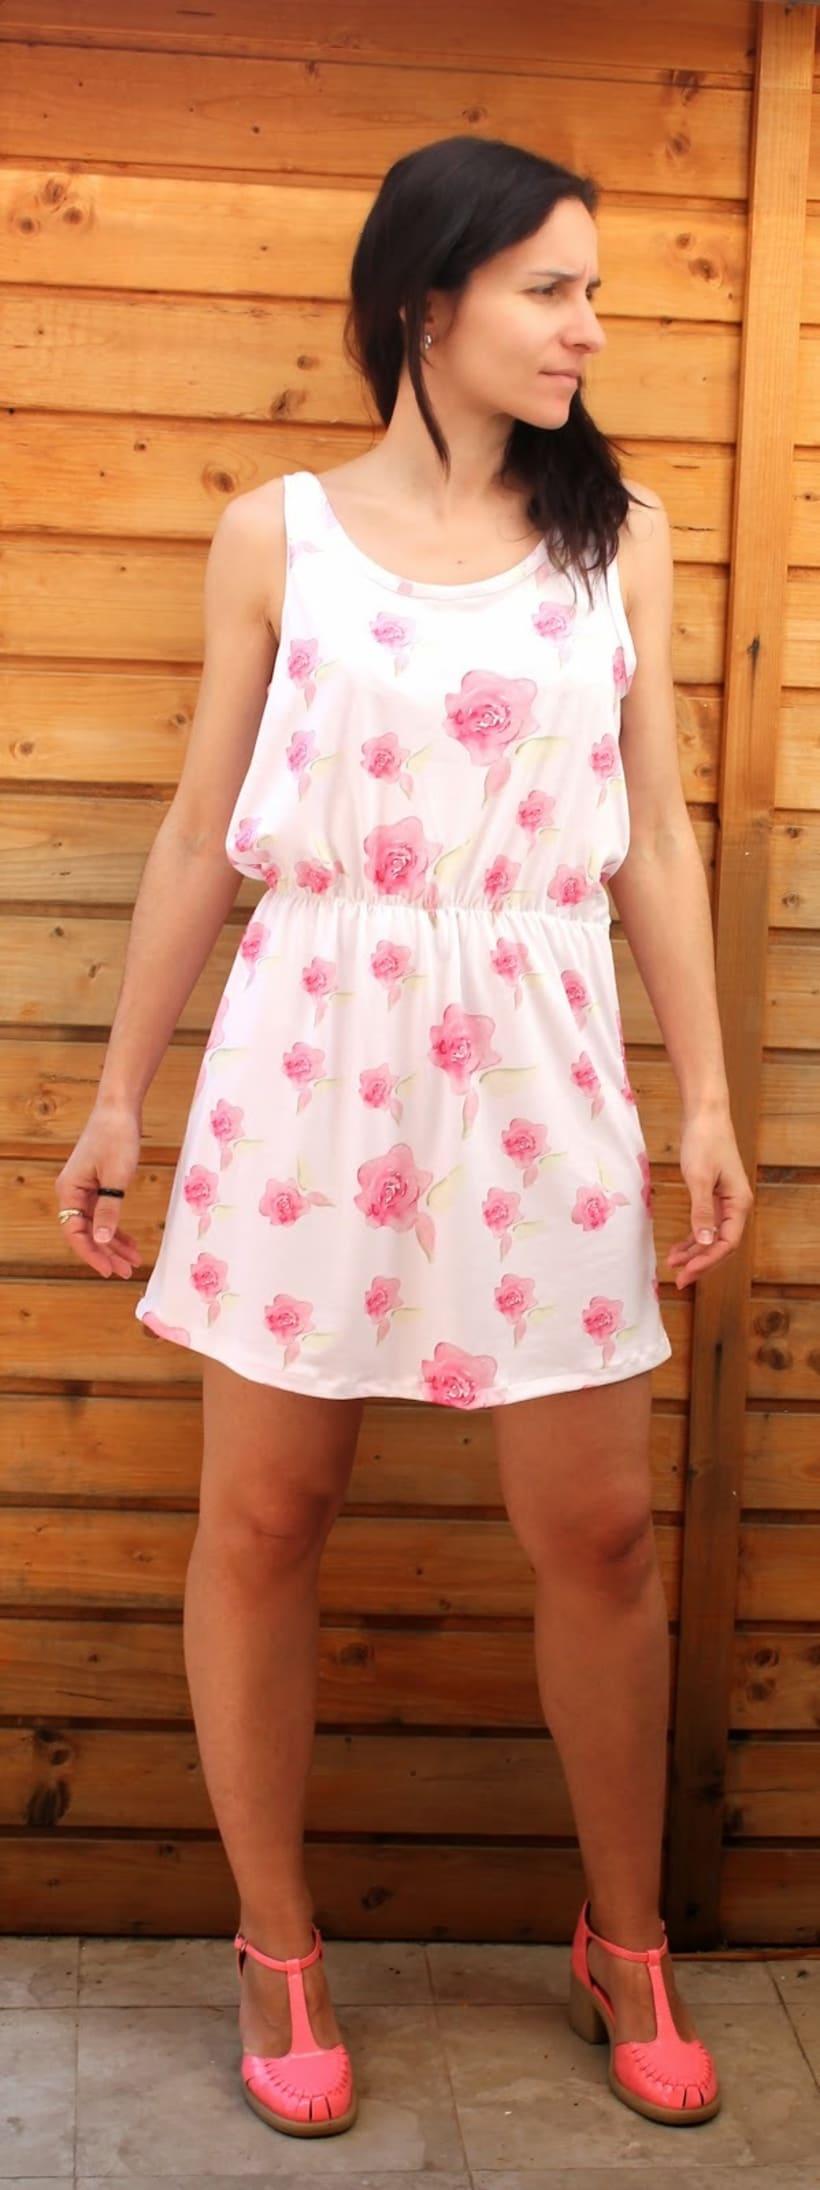 Colección mini dresses 1